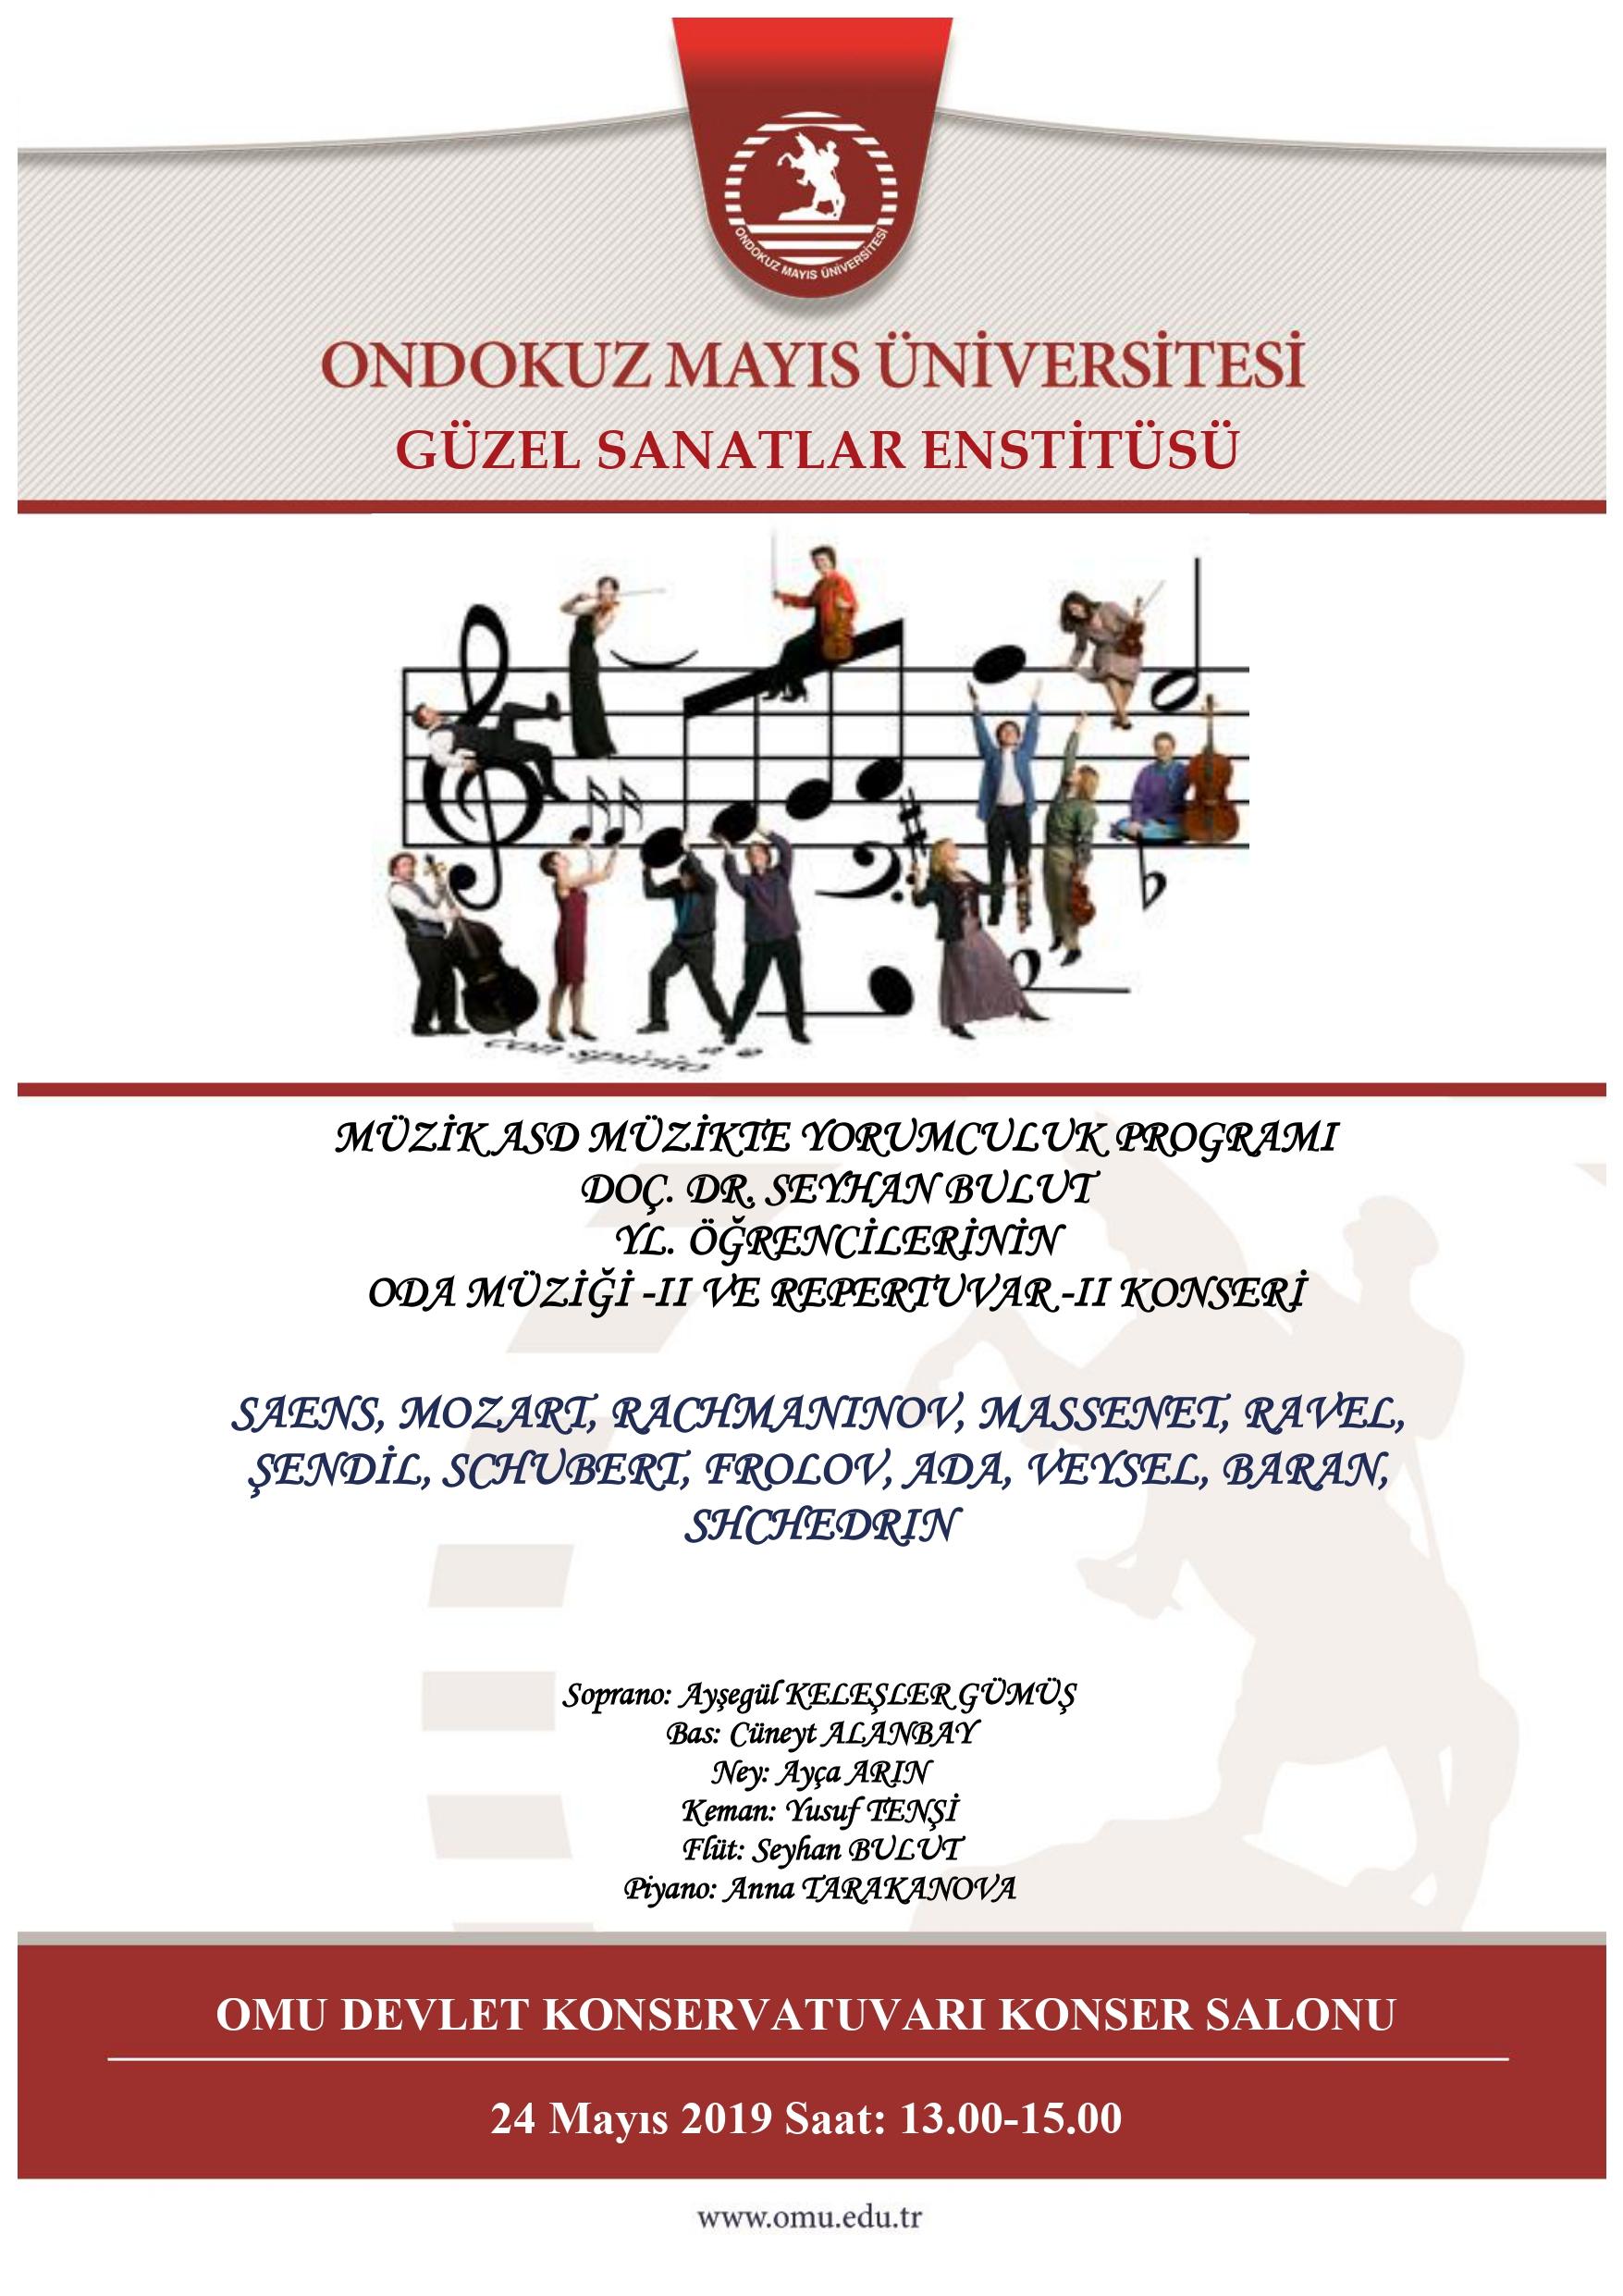 http://www.omu.edu.tr/sites/default/files/rept_ii_afis_bastir_page-0001.jpg